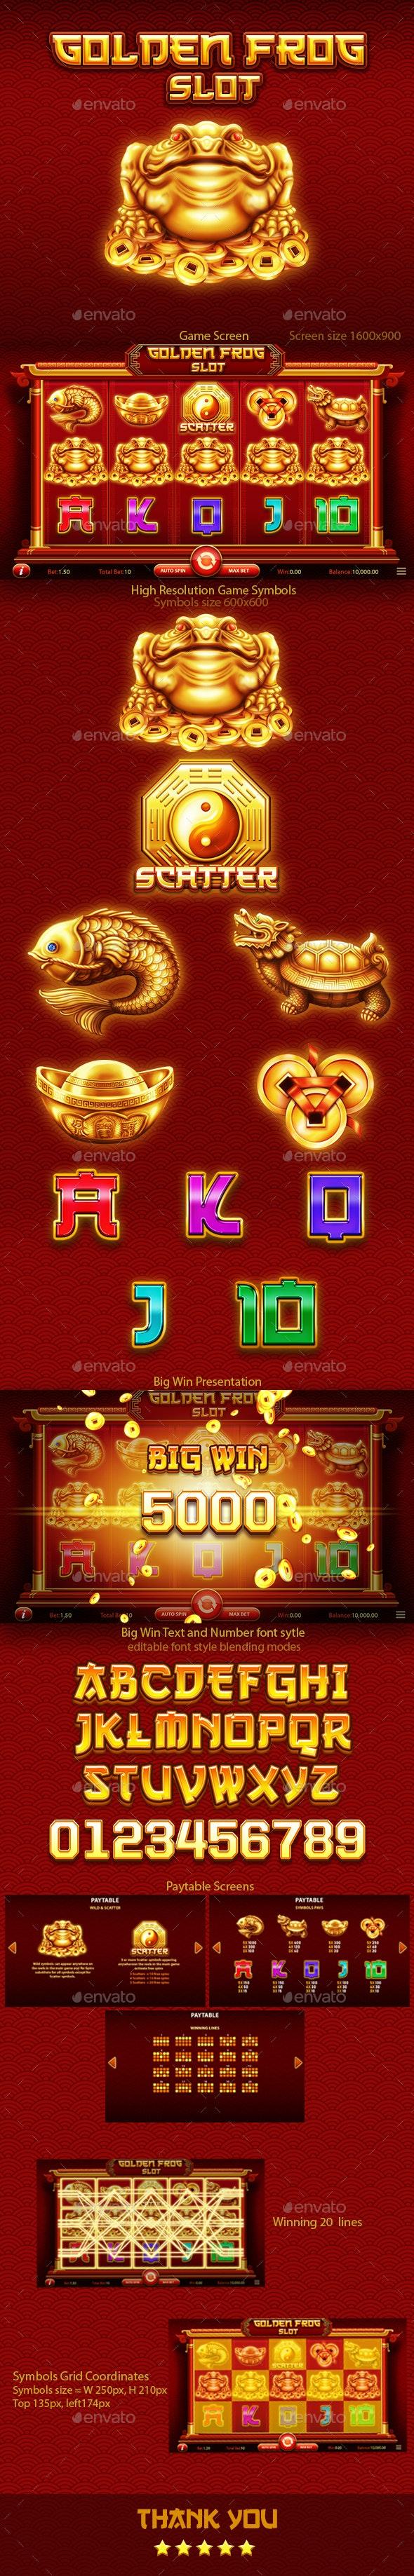 Chinese Golden Frog Slot Game Kit